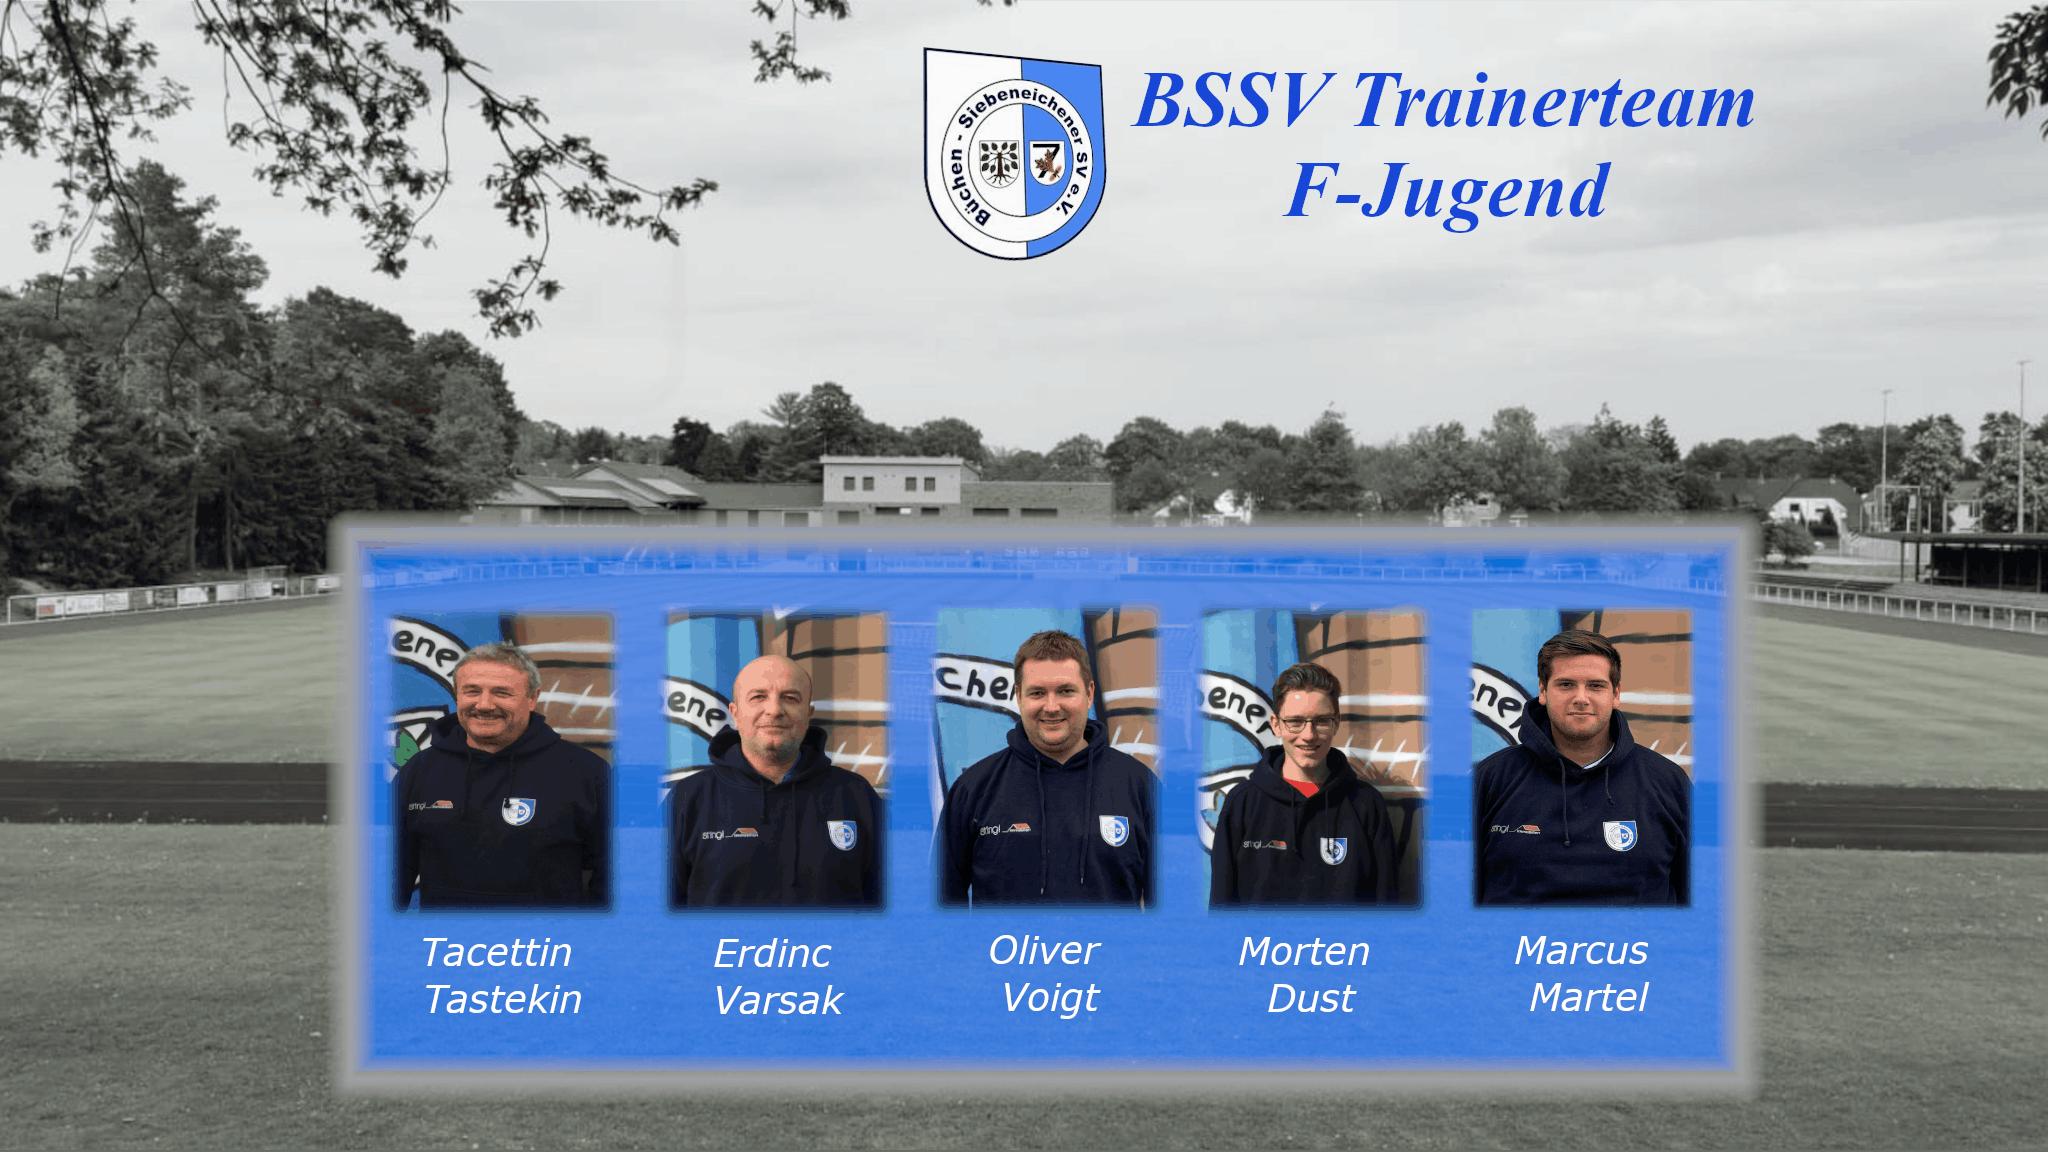 Trainerteam_F_Jugend